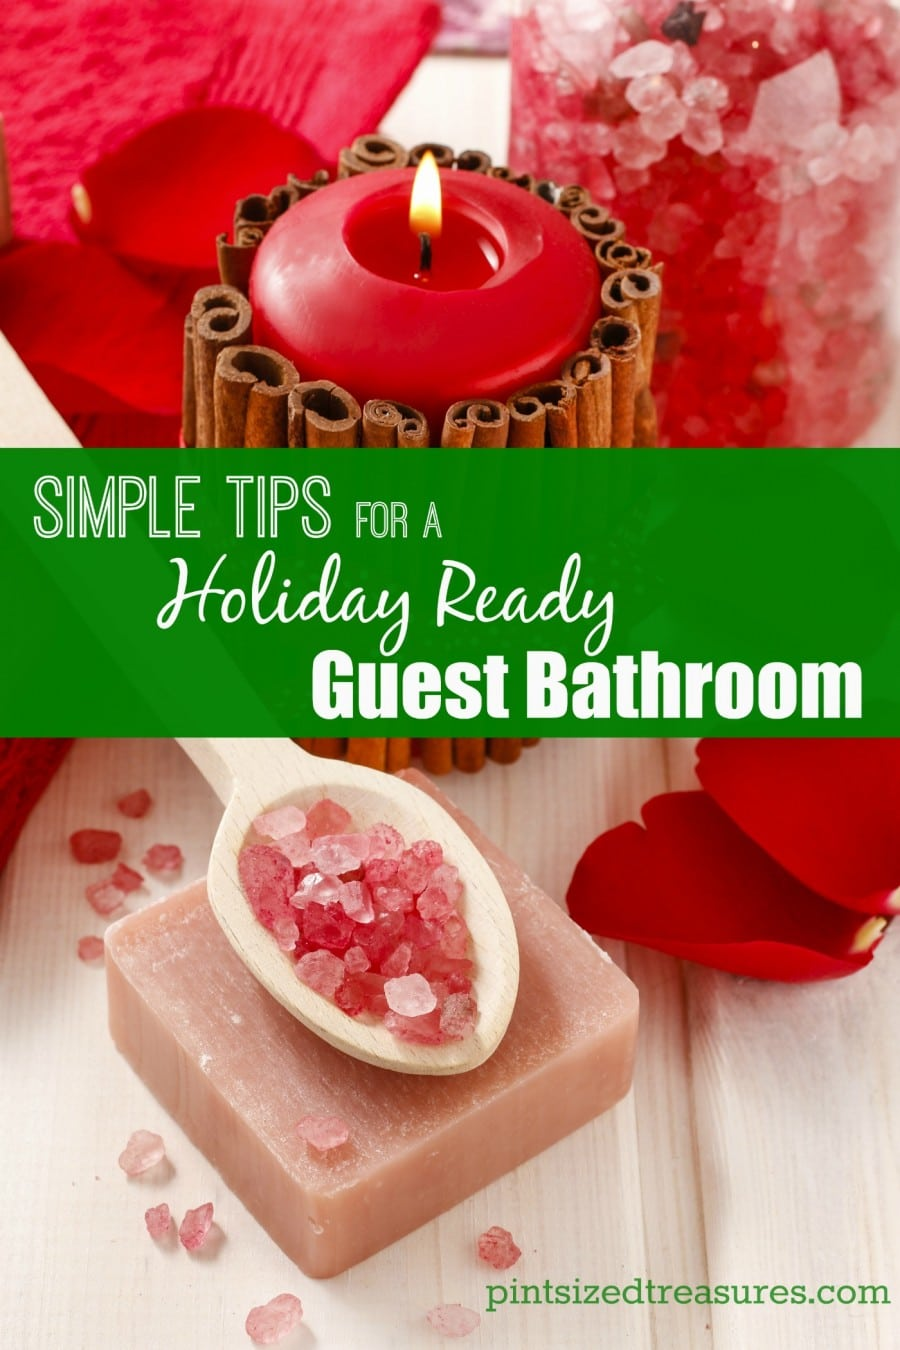 guest bathroom holiday decor ideas